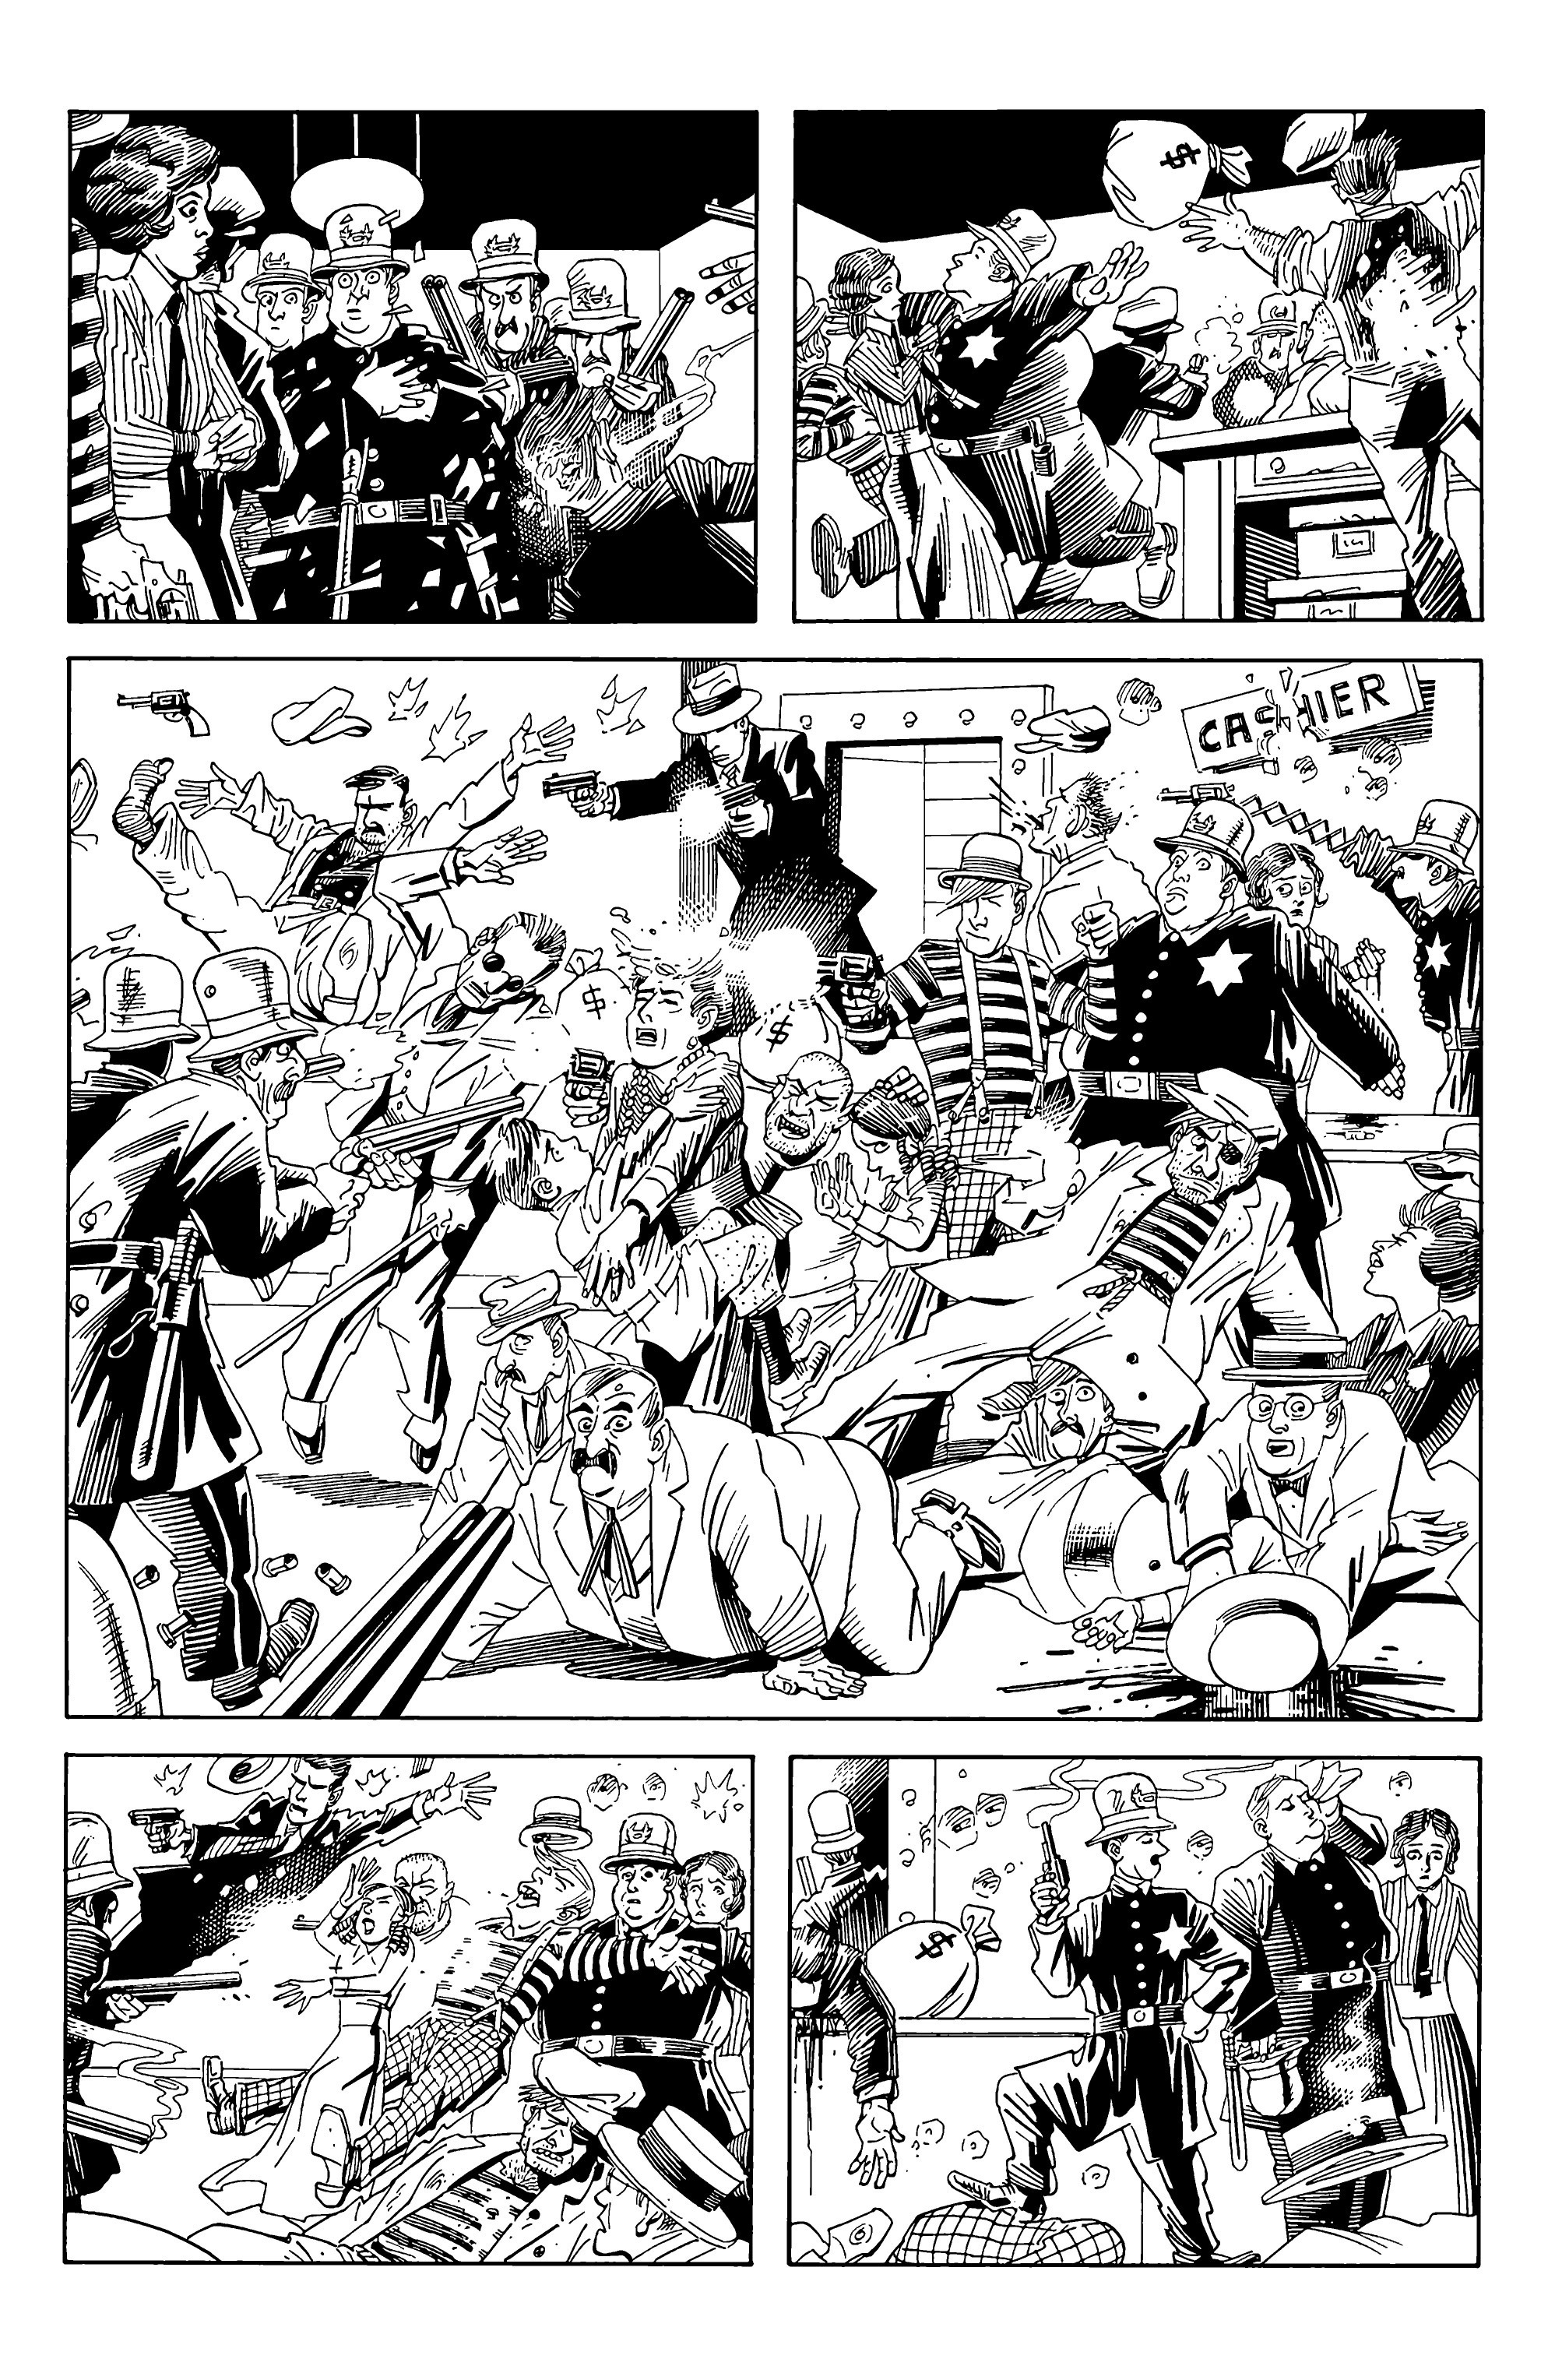 Read online Alan Moore's Cinema Purgatorio comic -  Issue #1 - 9